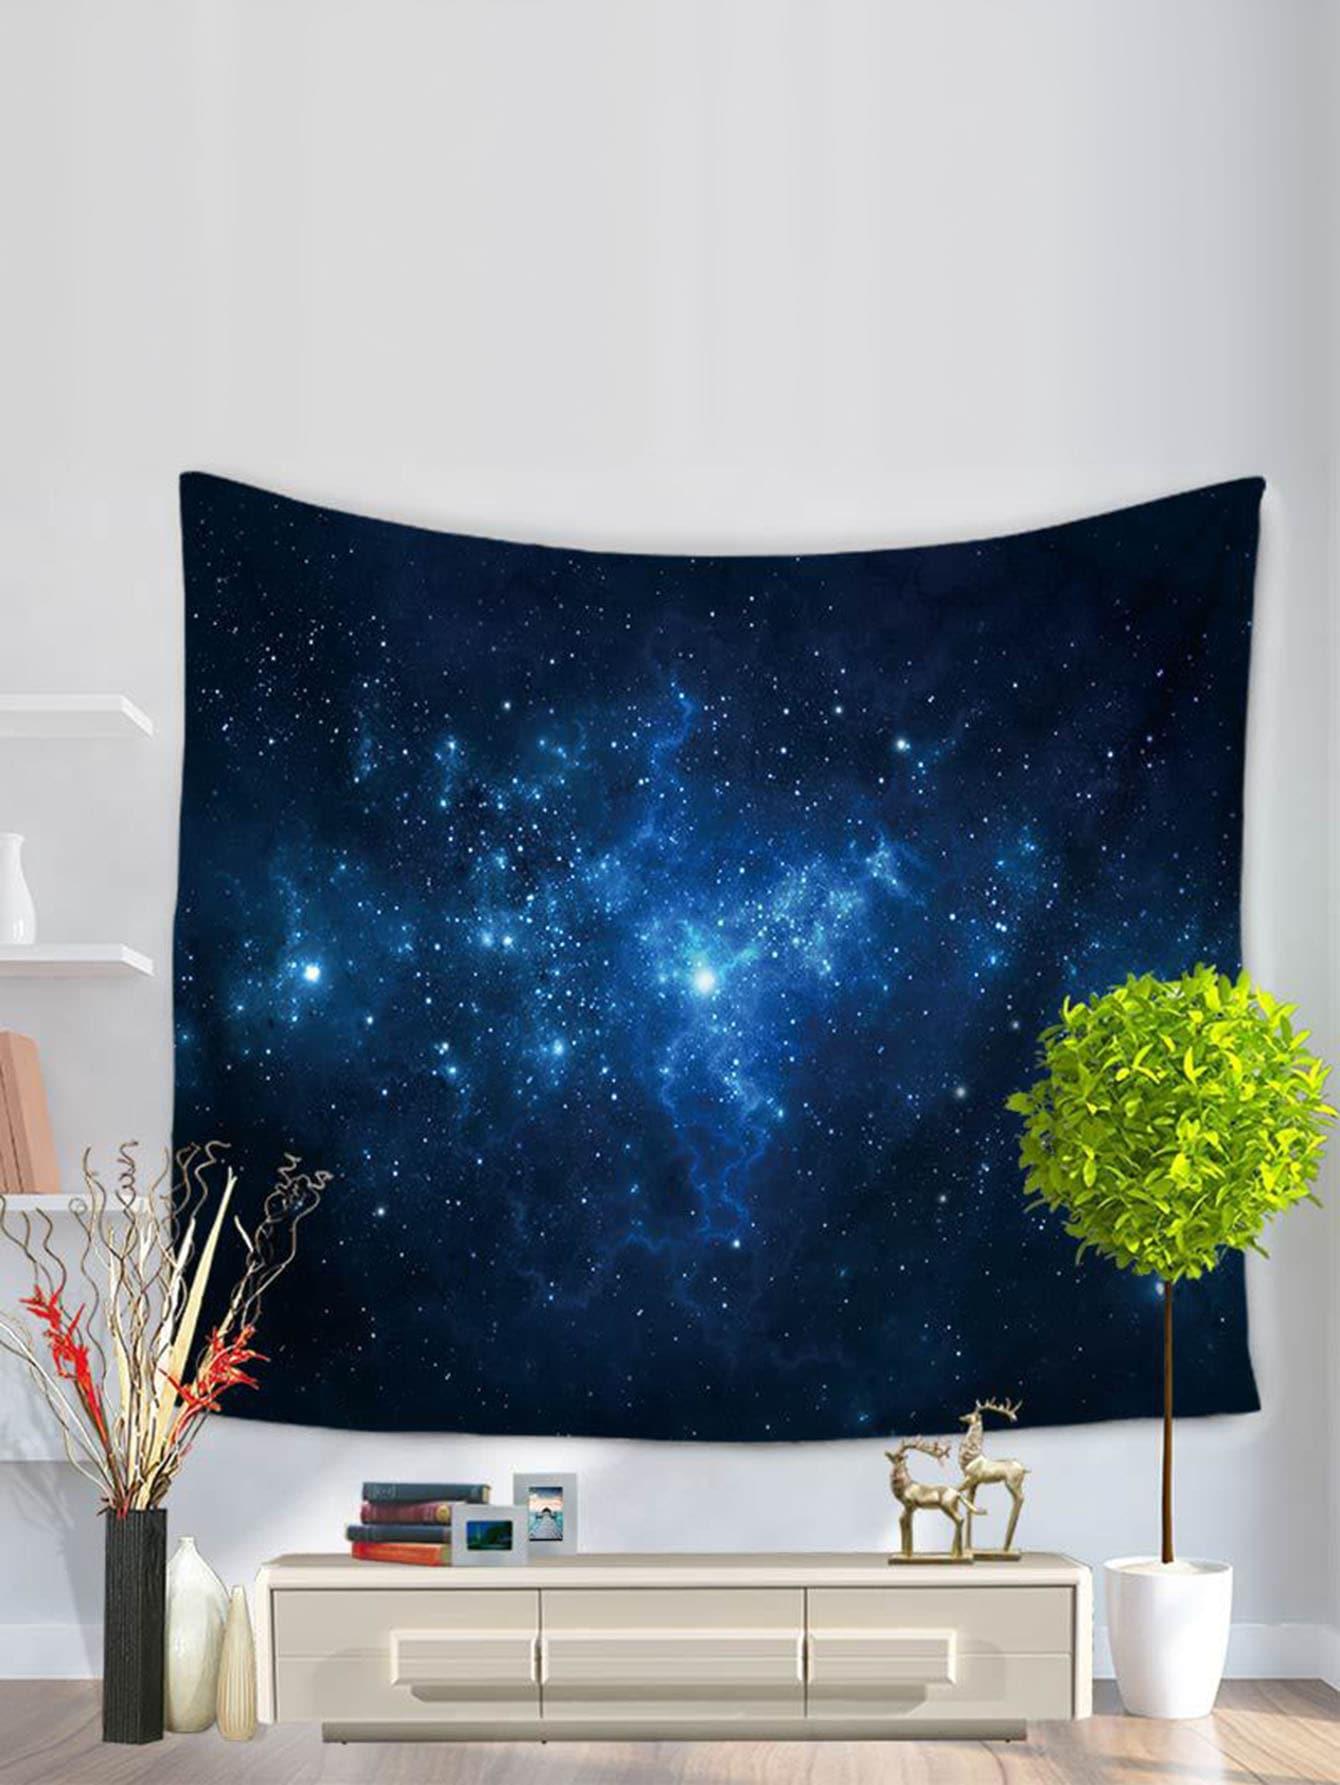 Купить Настенныйковерс рисунком звёздного неба, null, SheIn